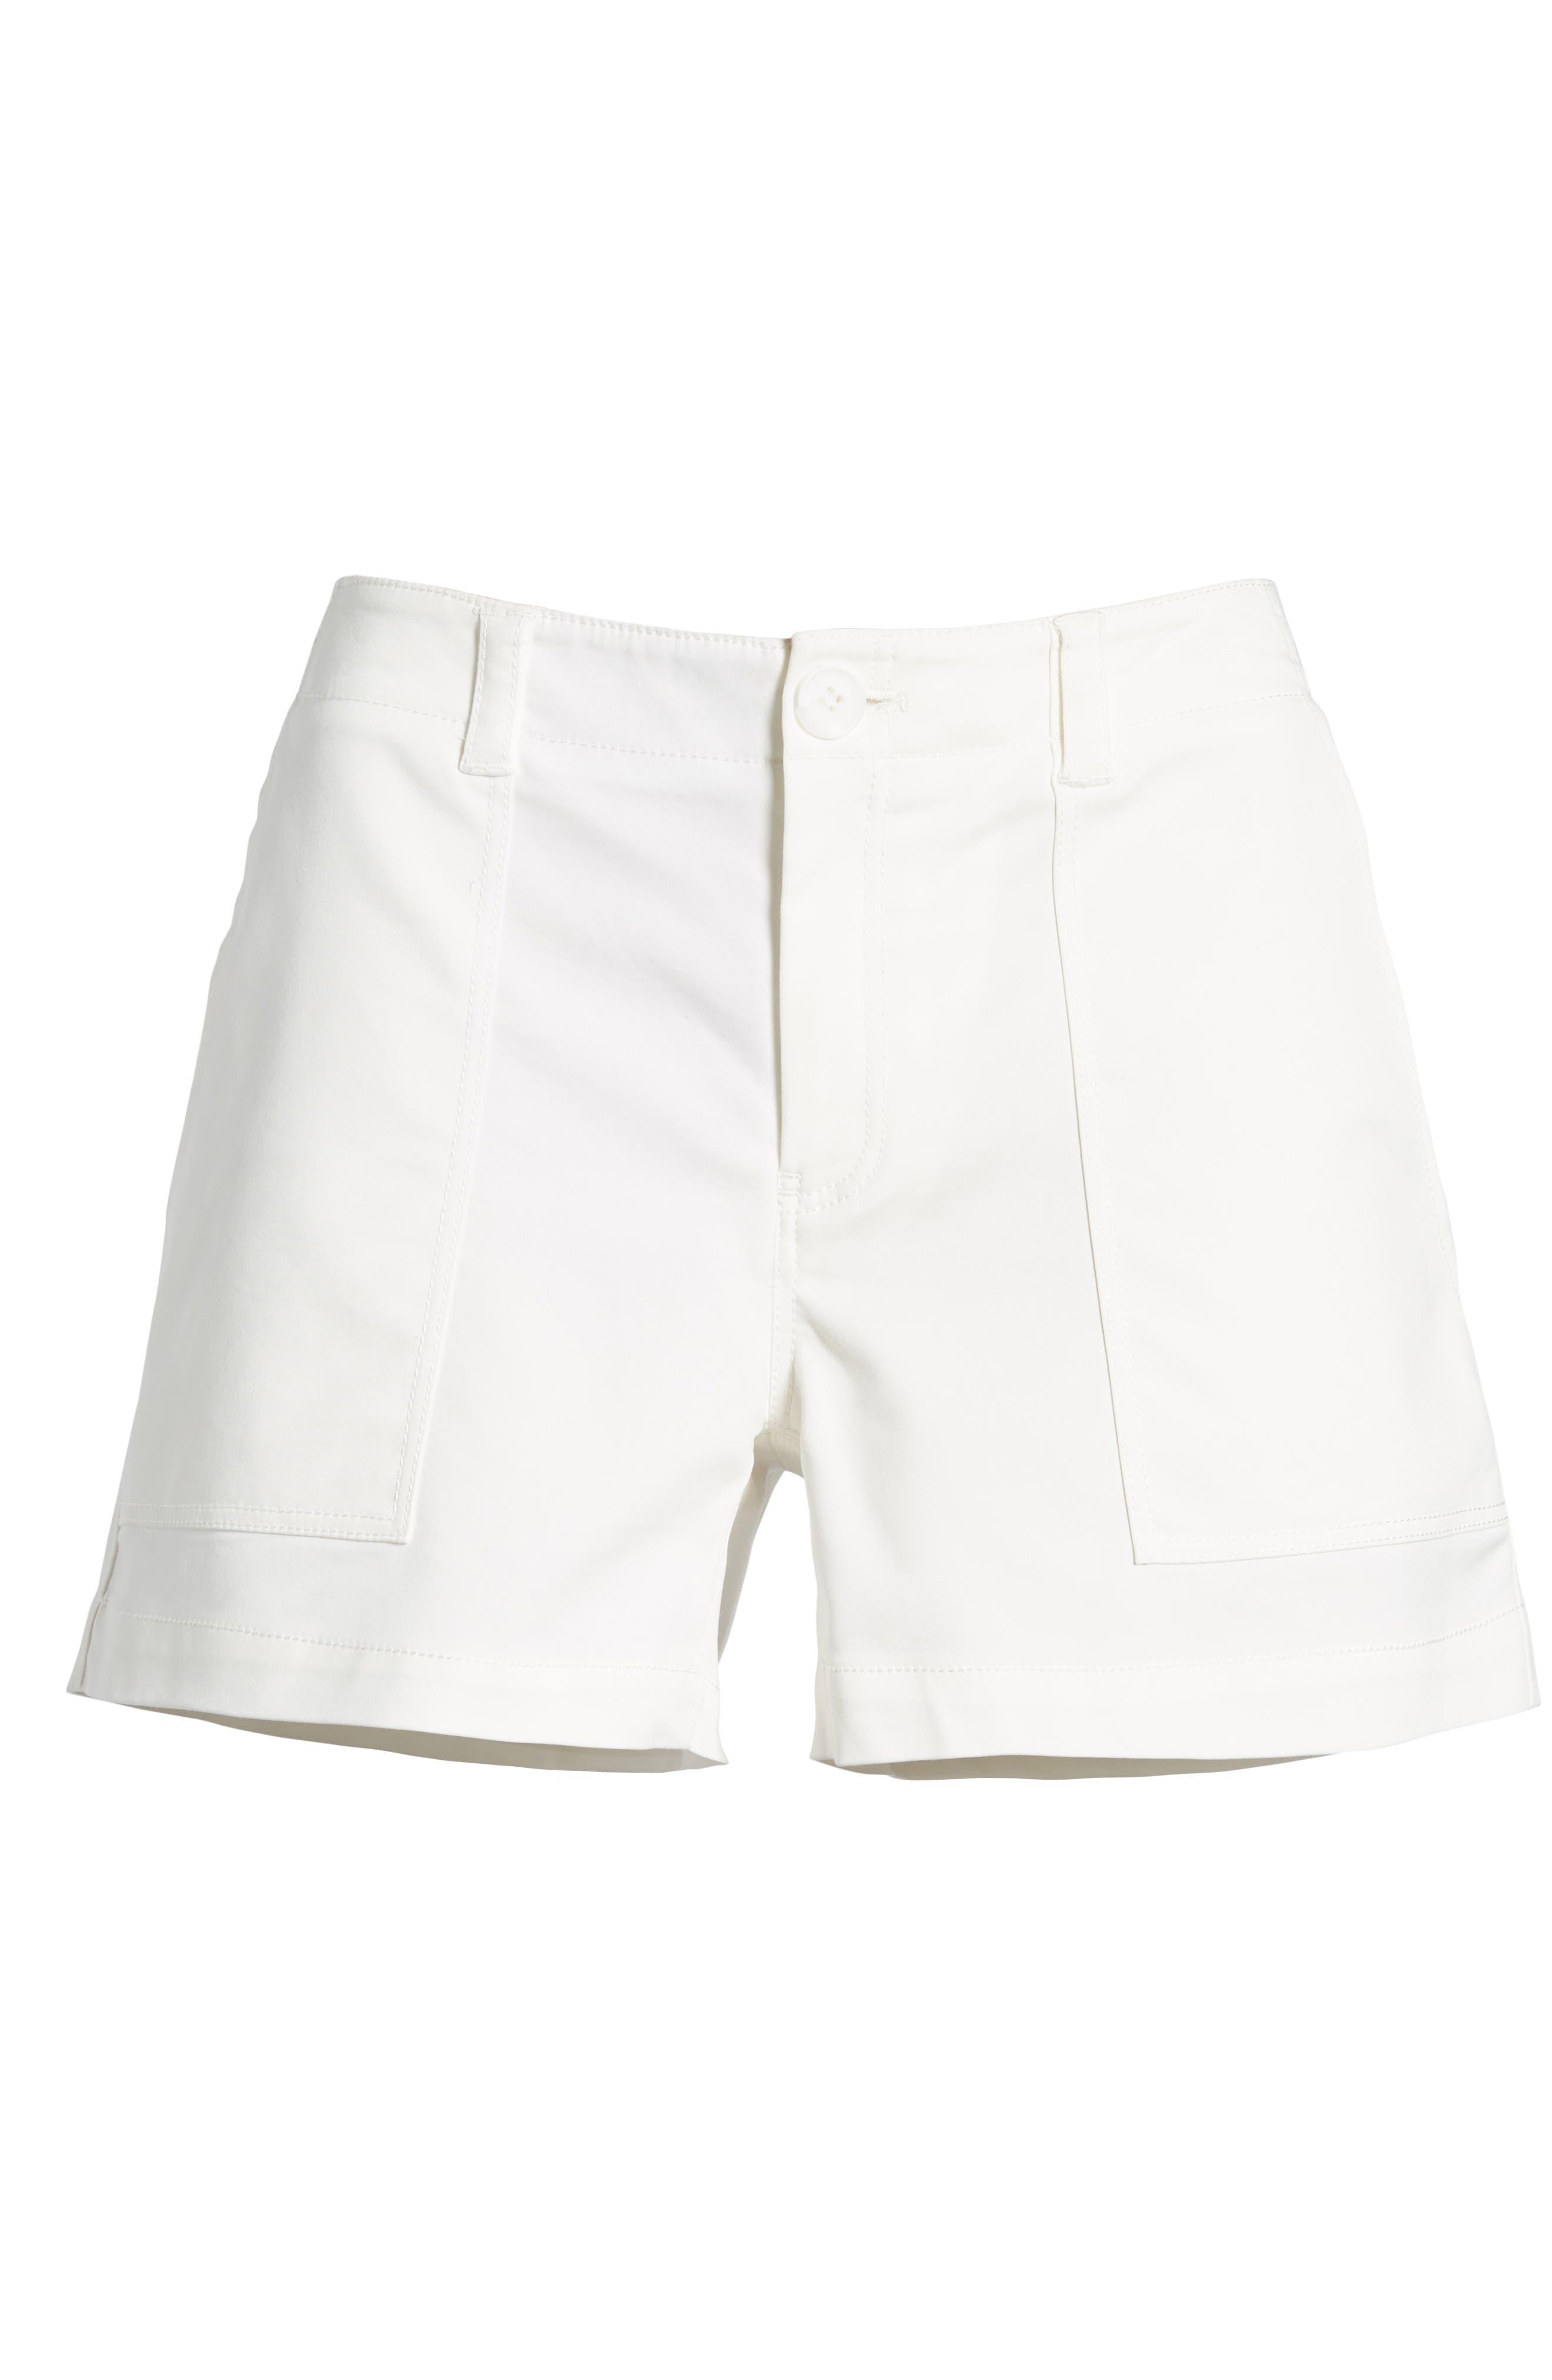 Patch Pocket Shorts,                             Alternate thumbnail 6, color,                             White